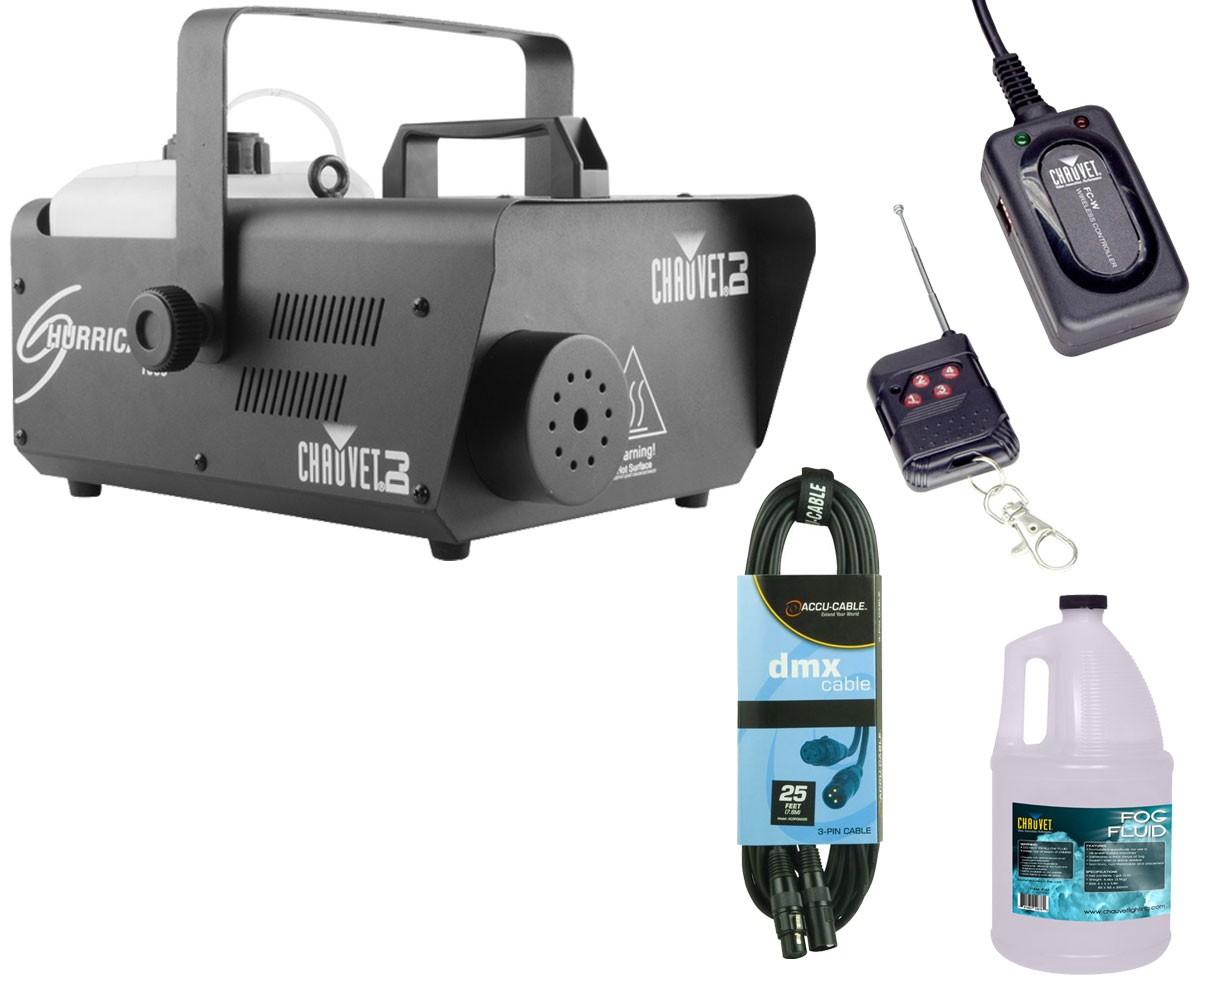 Chauvet Hurricane 1600 + Wireless Remote + Fluid Gallon + DMX Cable